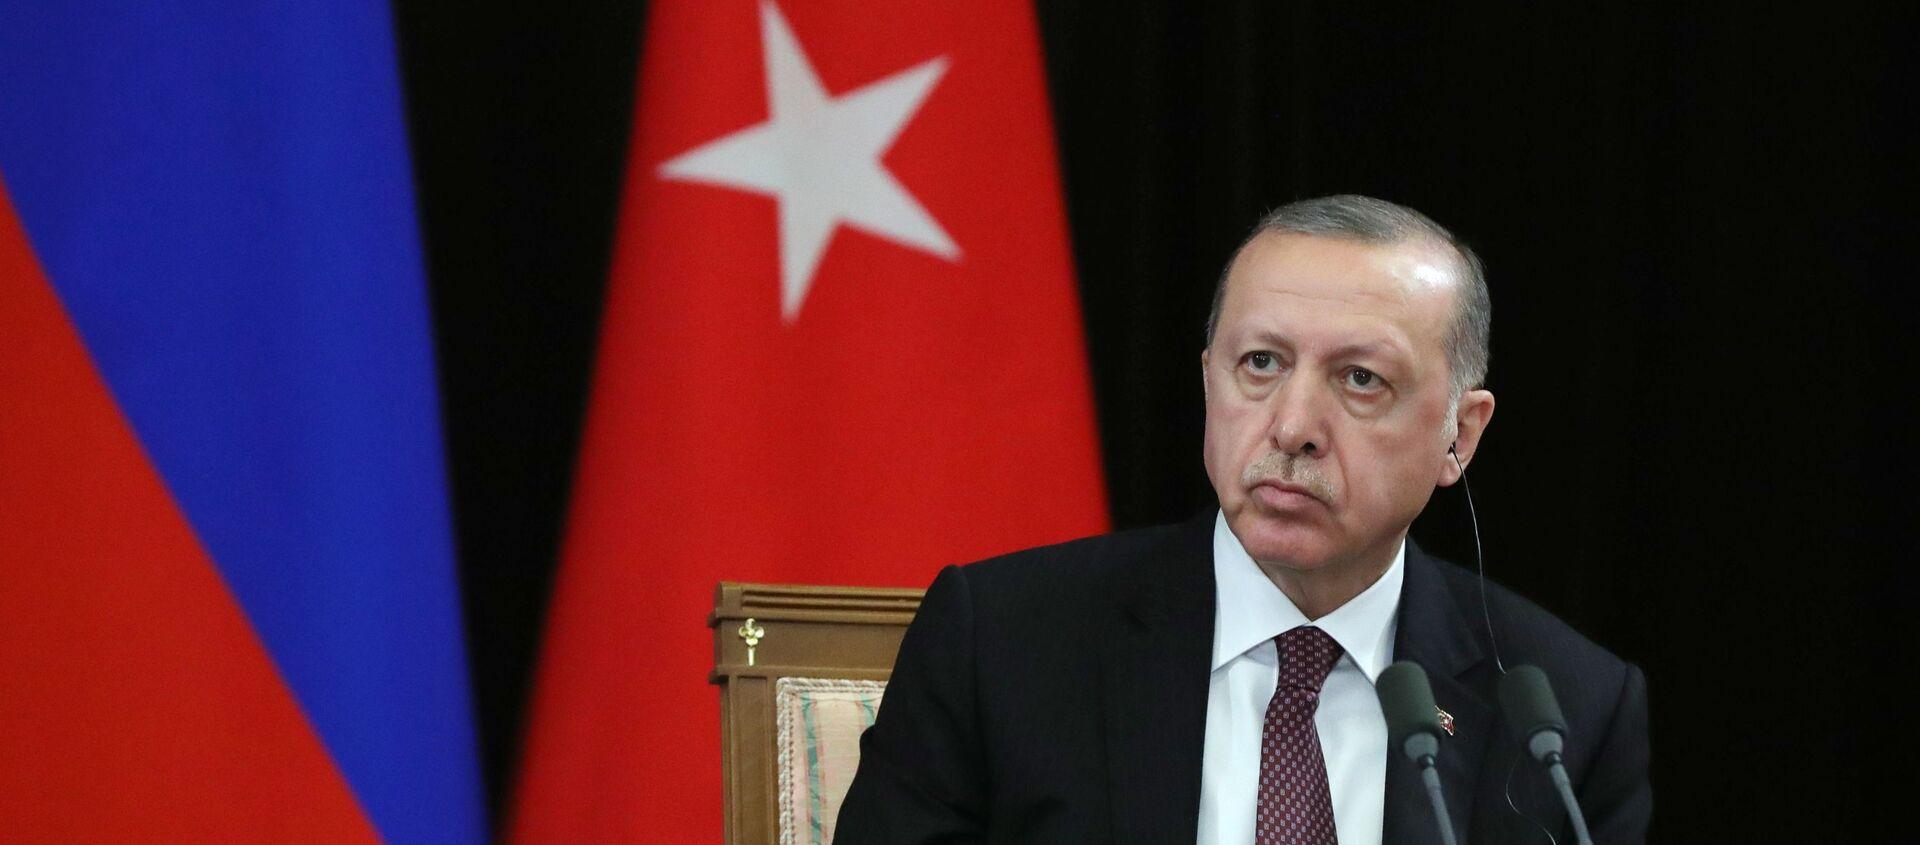 Il presidente turco Recep Tayyip Erdogan - Sputnik Italia, 1920, 08.05.2021